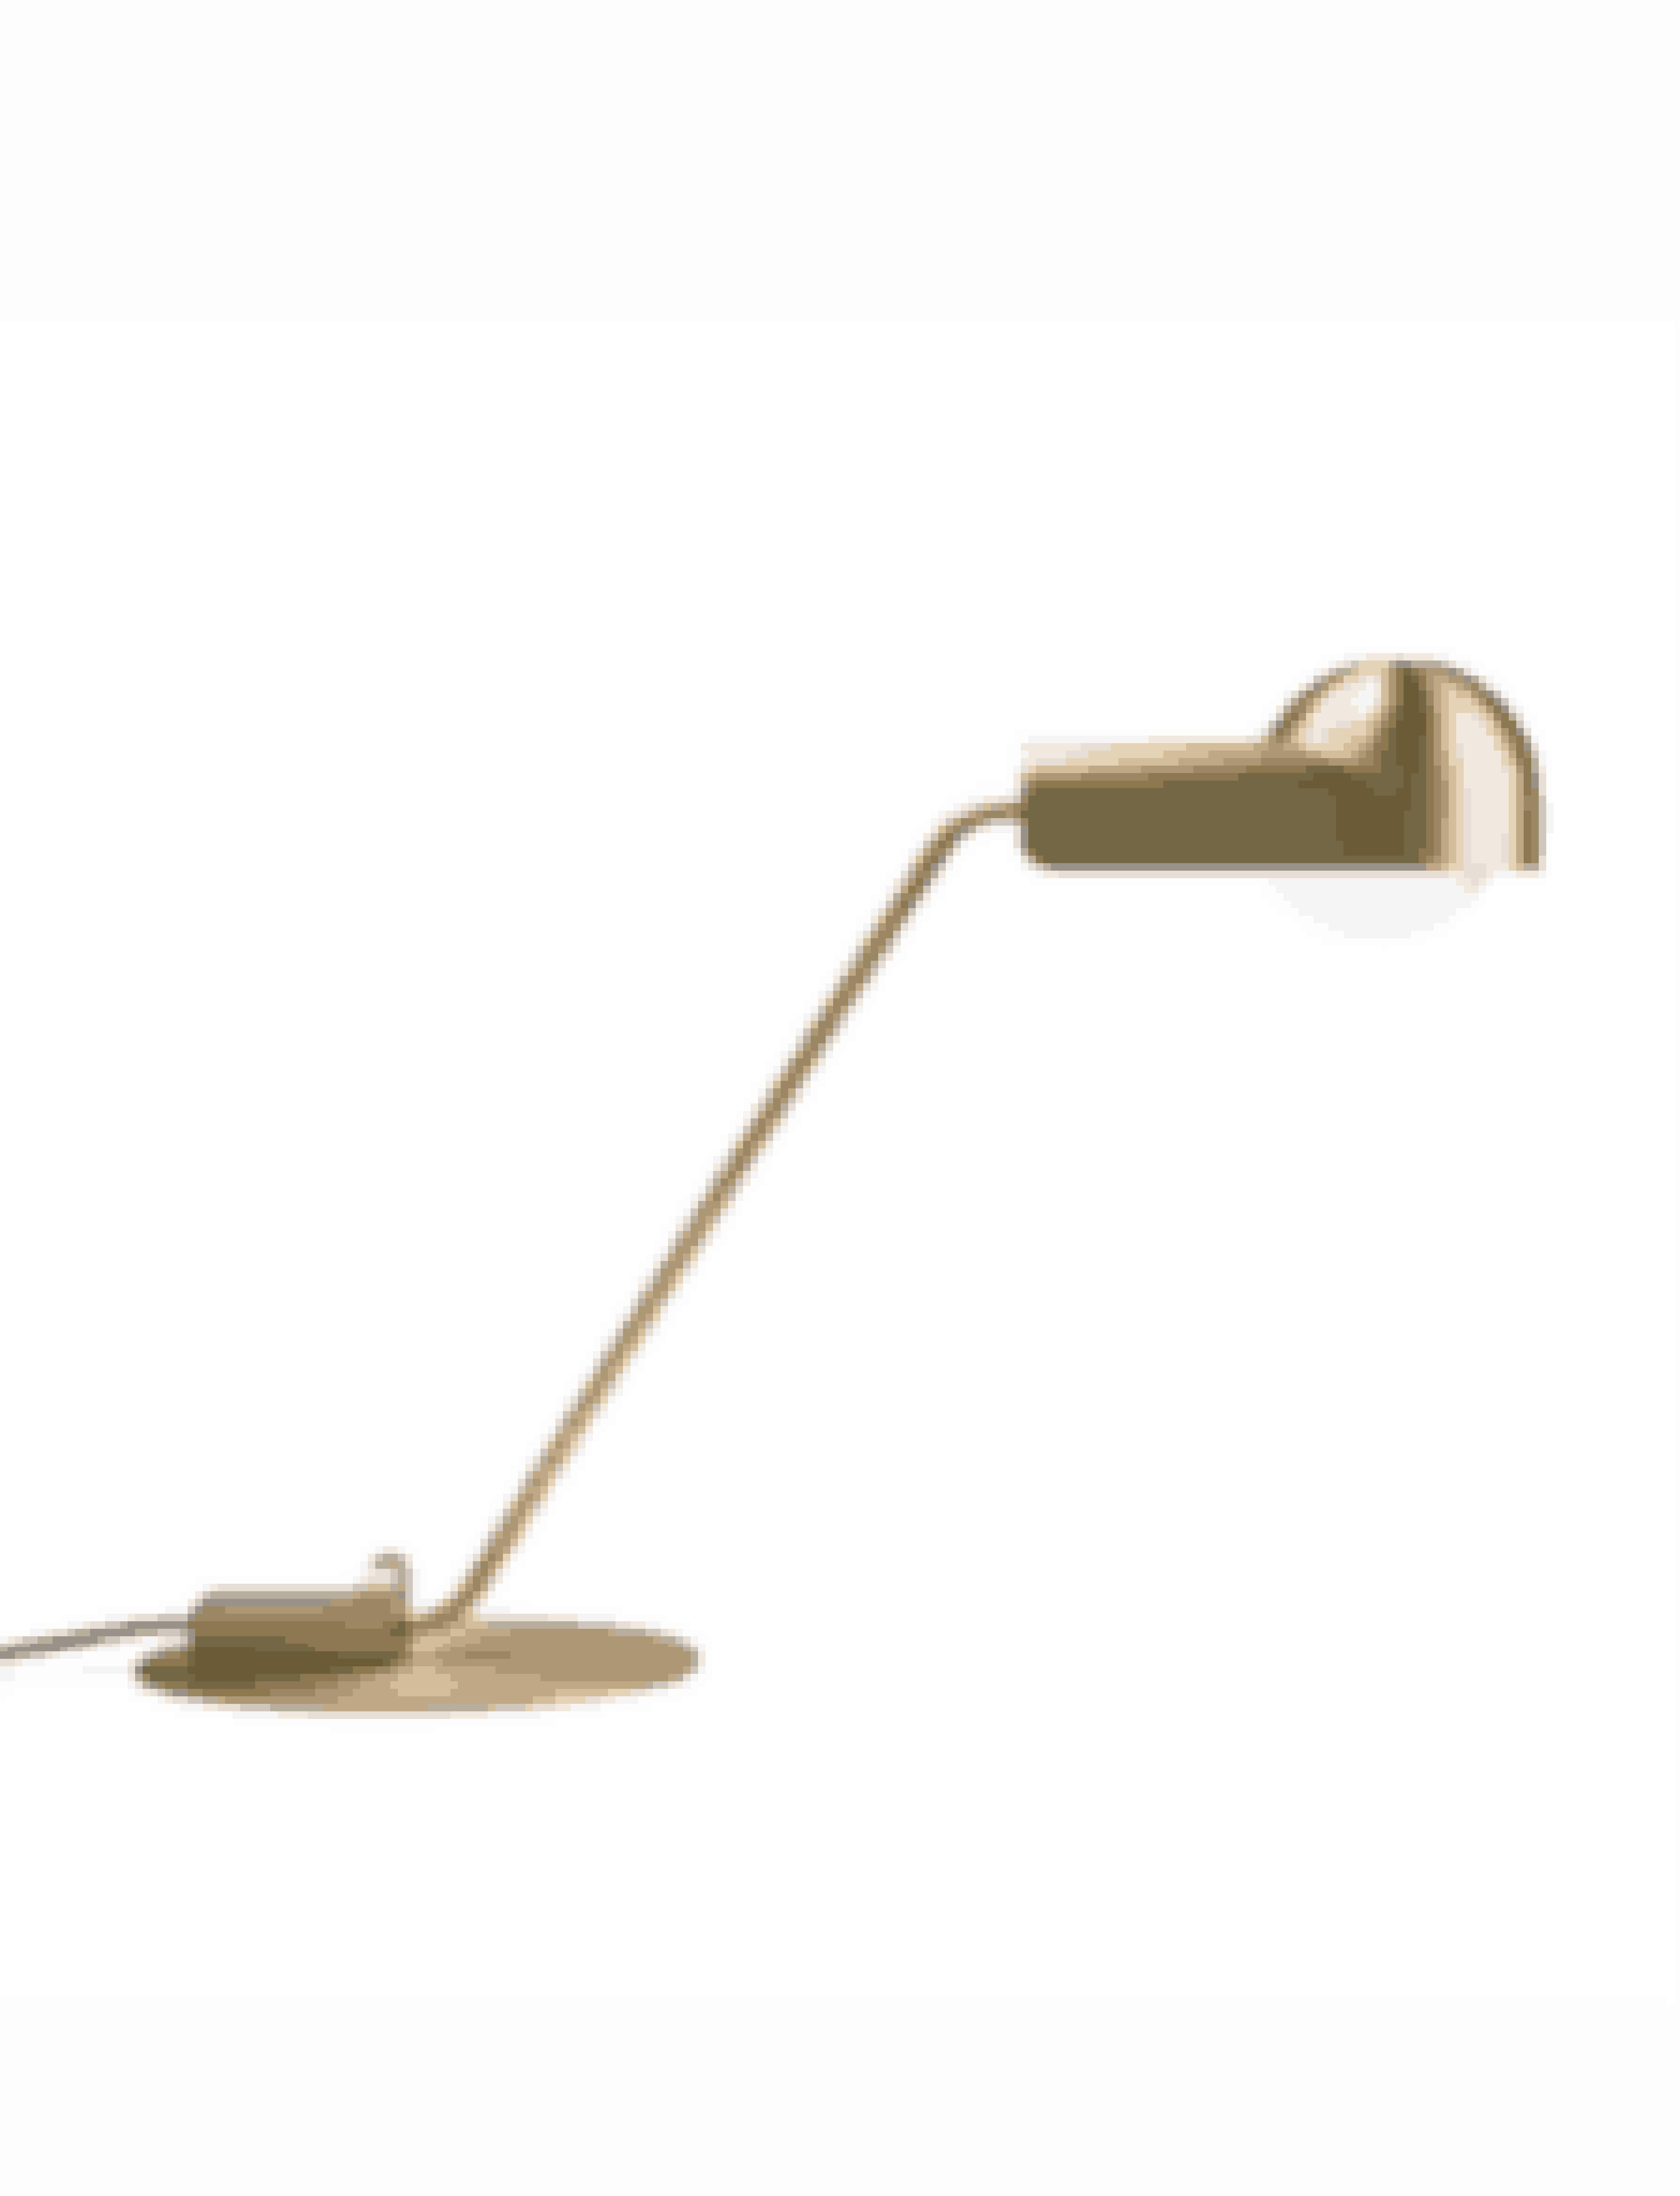 'Domo'-lampe, Karakter Copenhagen, 4.495 kr.Køb online her.